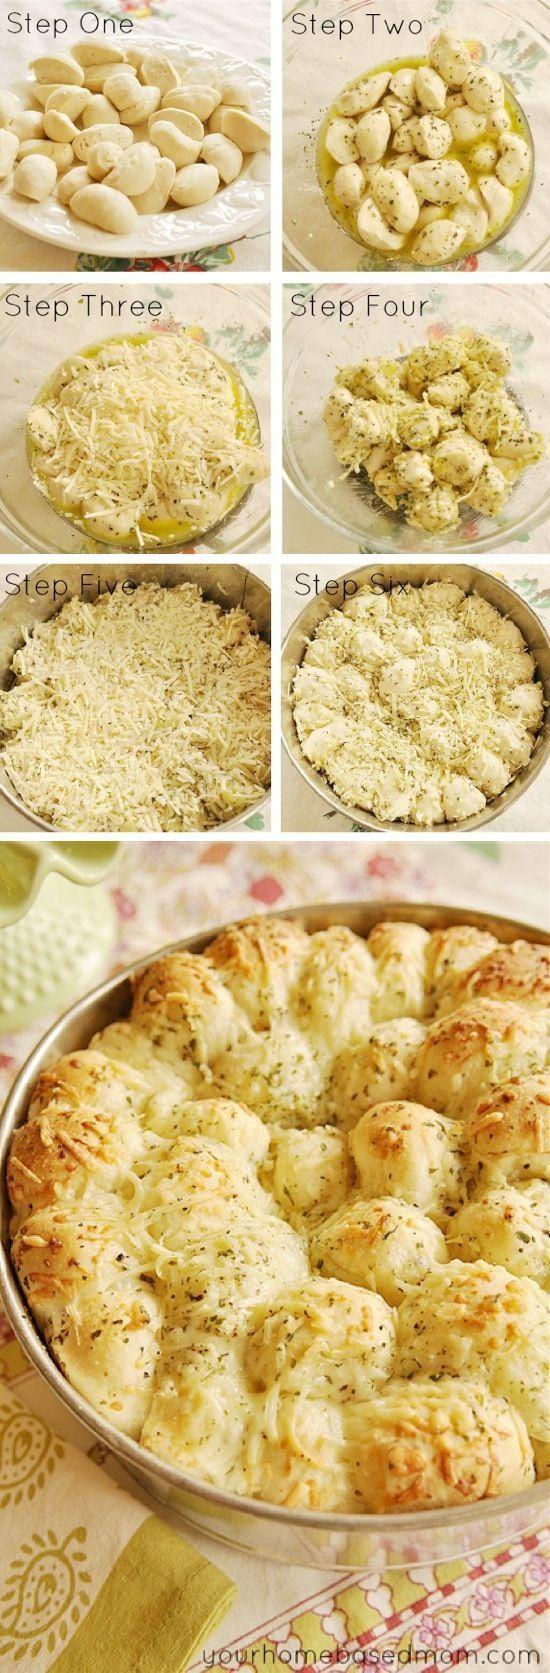 Garlic Cheese Monkey Bread using store-bought frozen bread dough